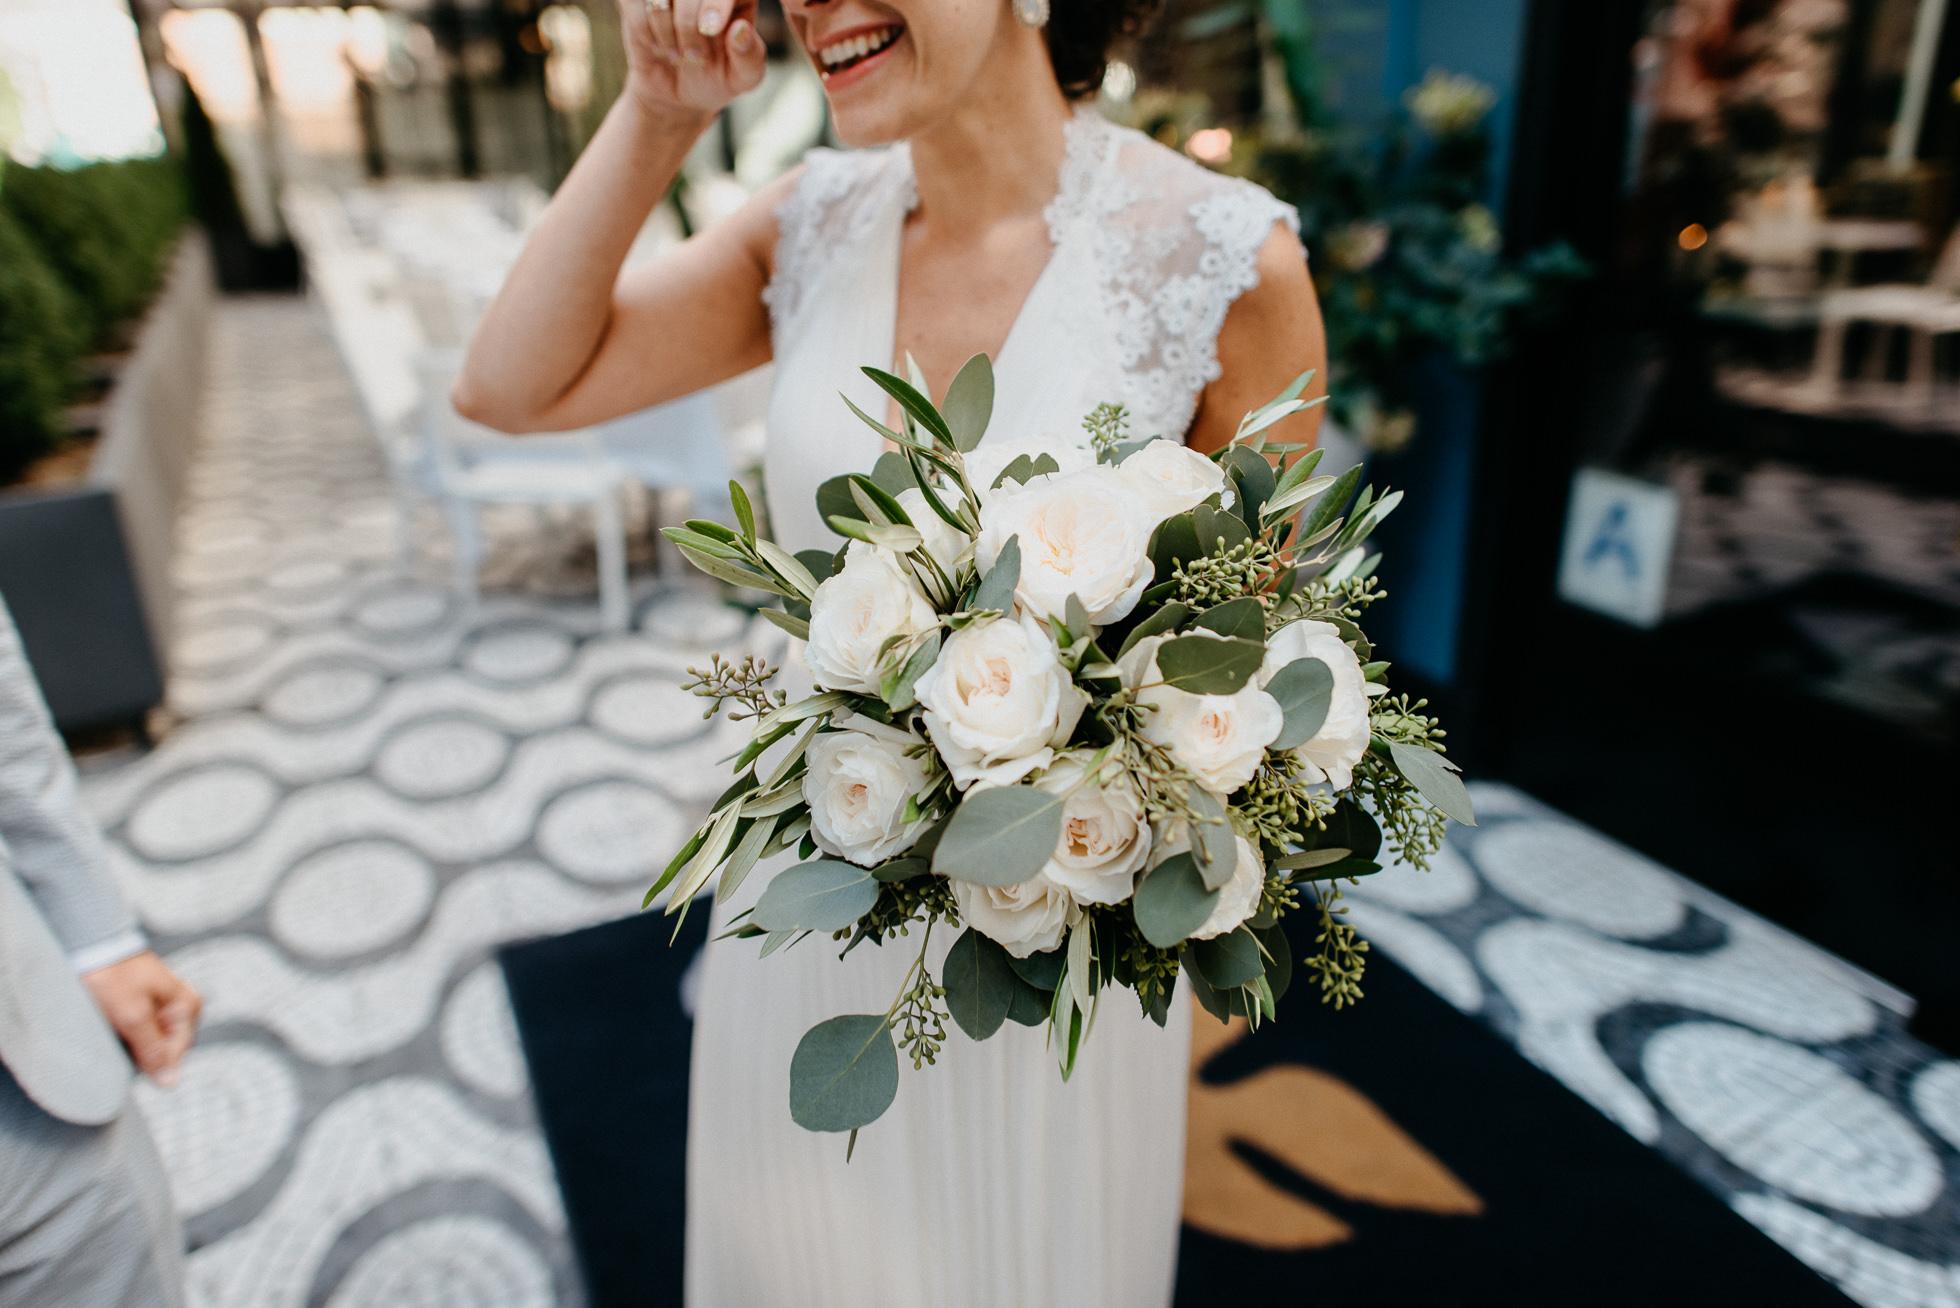 New York City wedding florists